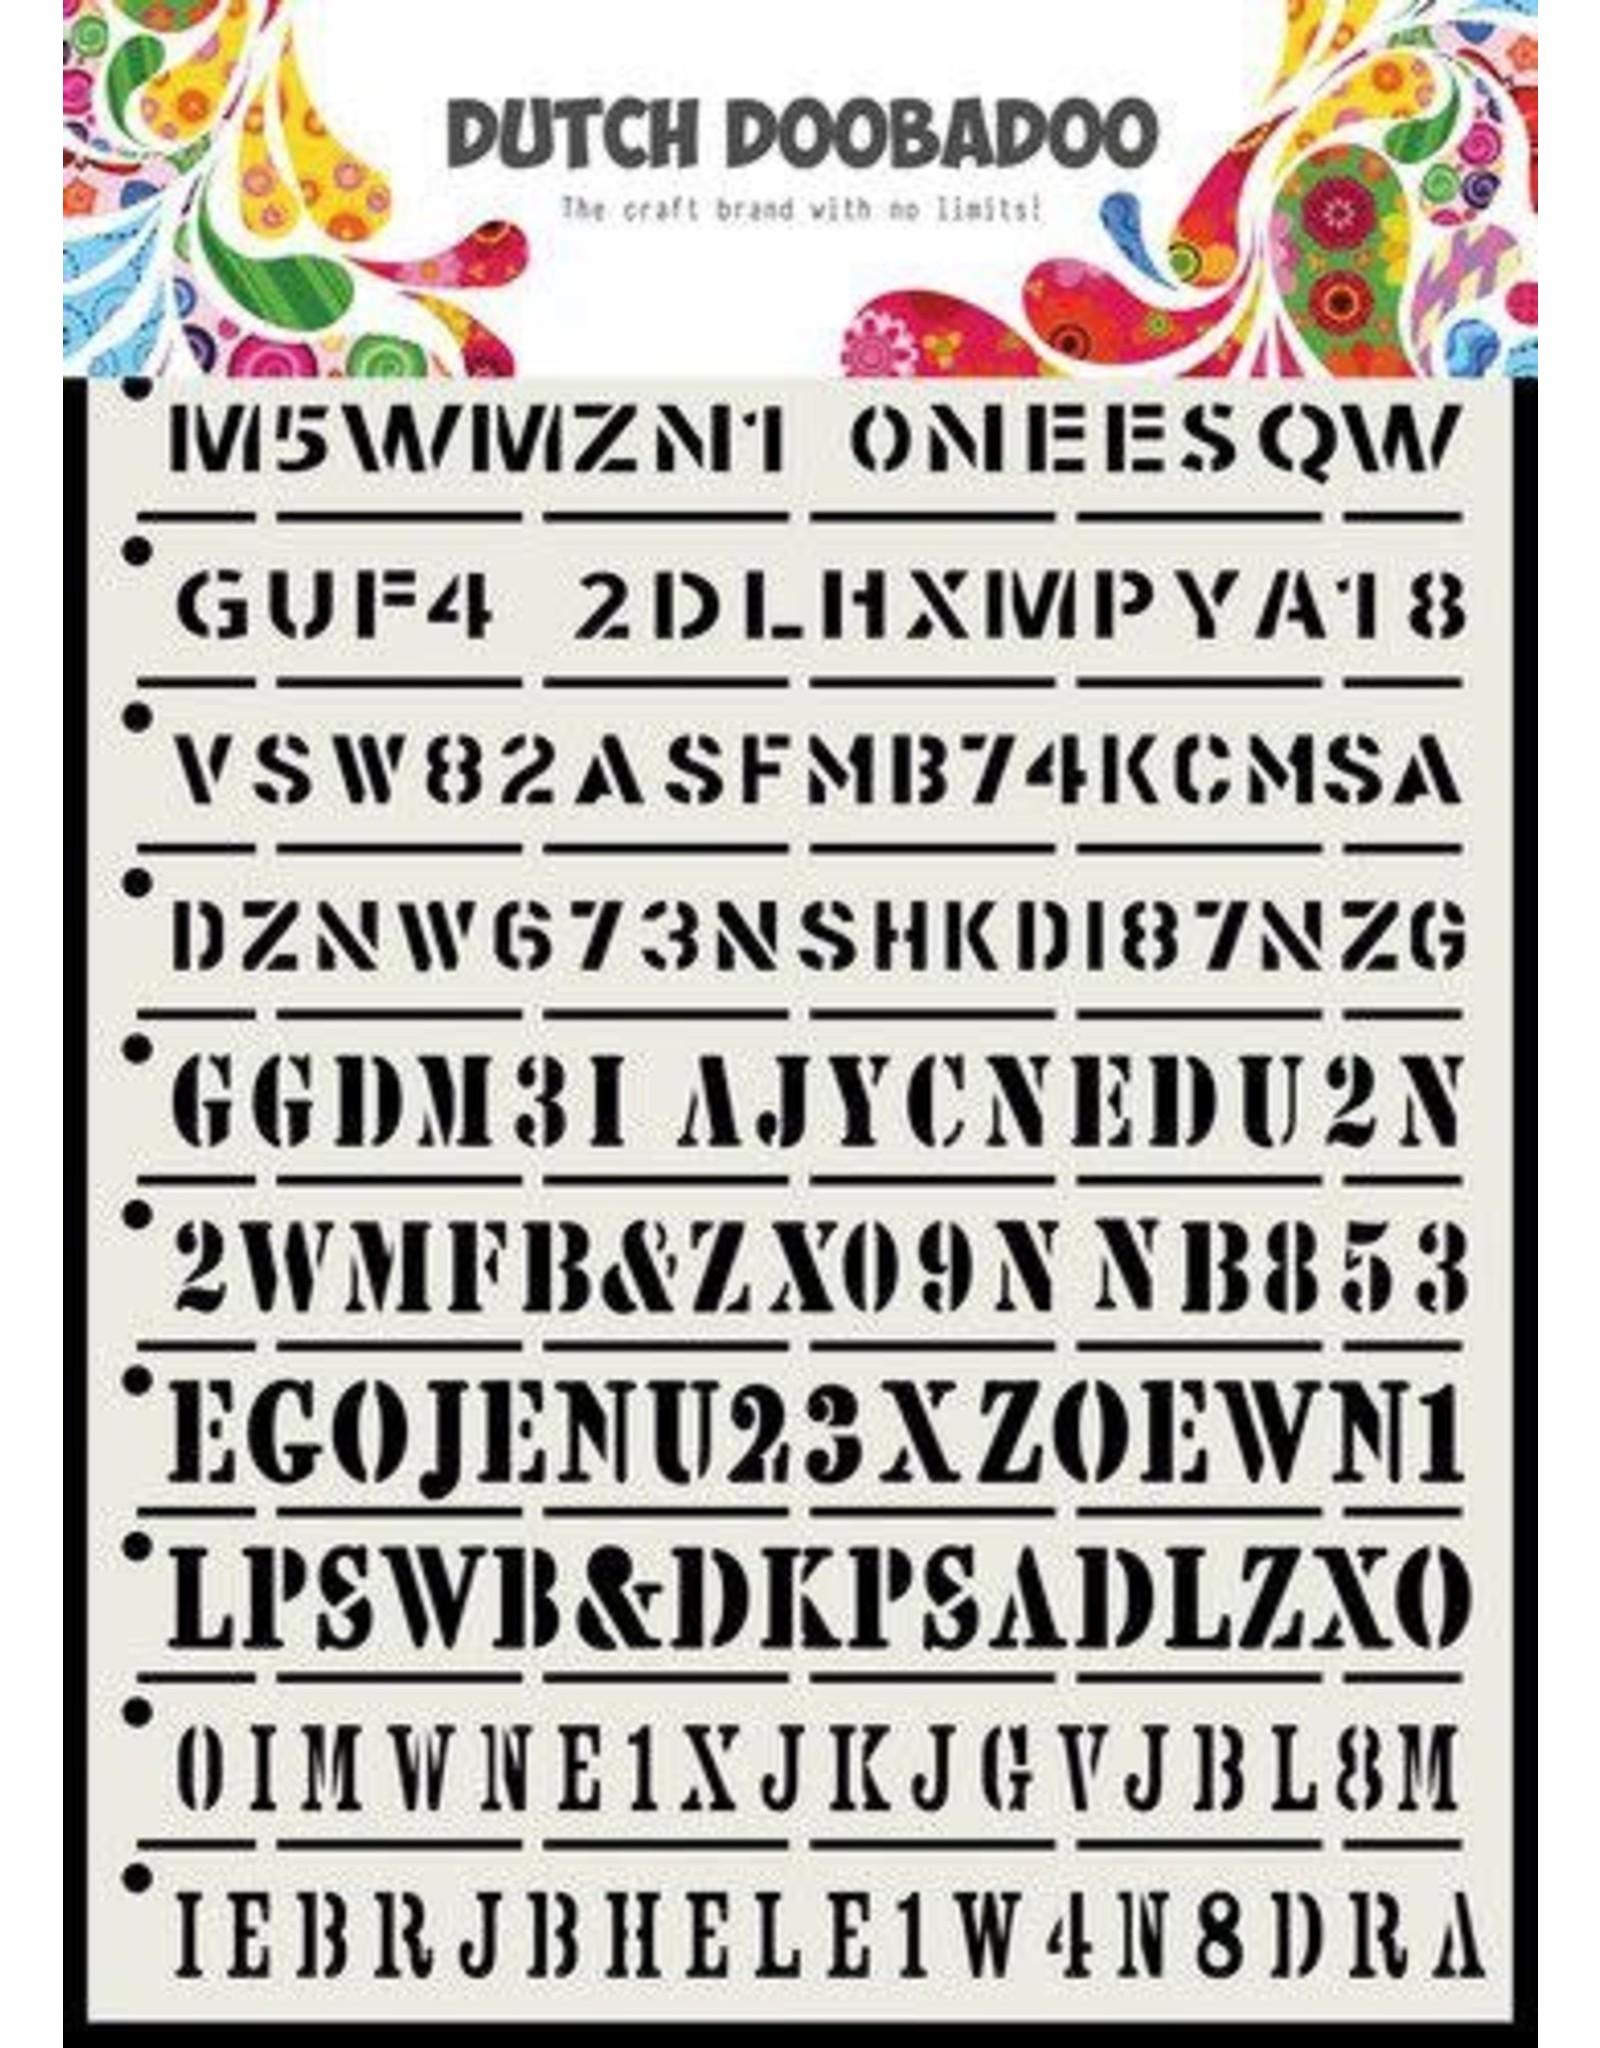 Dutch Doobadoo Dutch Doobadoo Dutch Mask Art Tekst strips A5 470.715.160